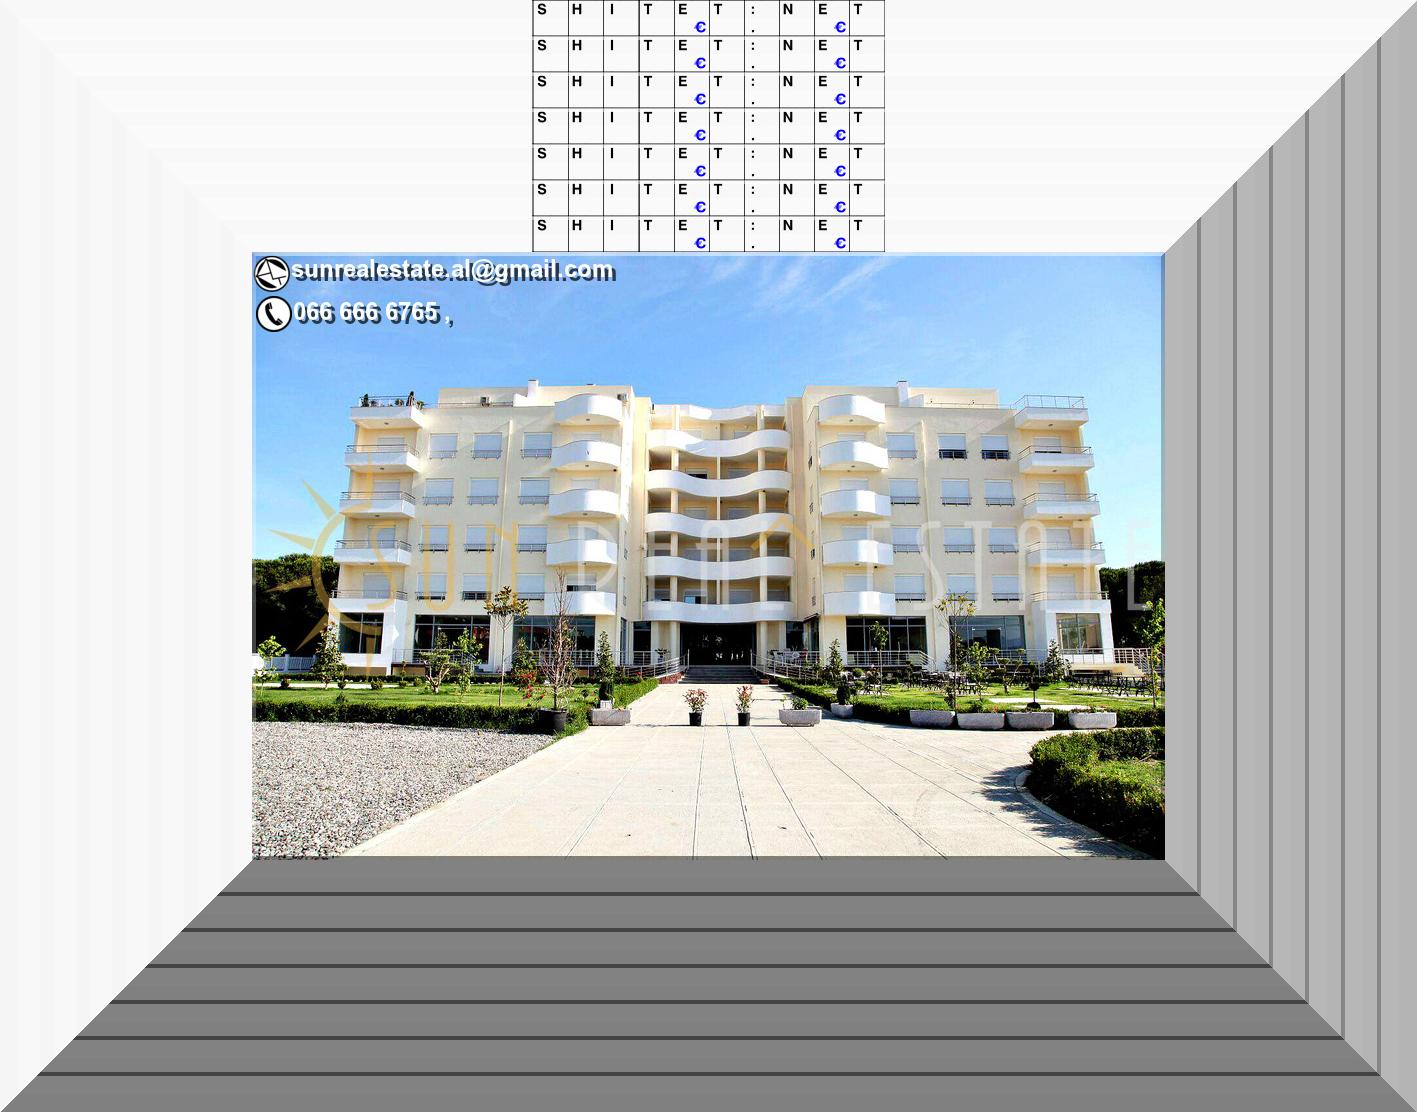 Apartamente pushimi 1+1 dhe 2+1 n� Velipoj�